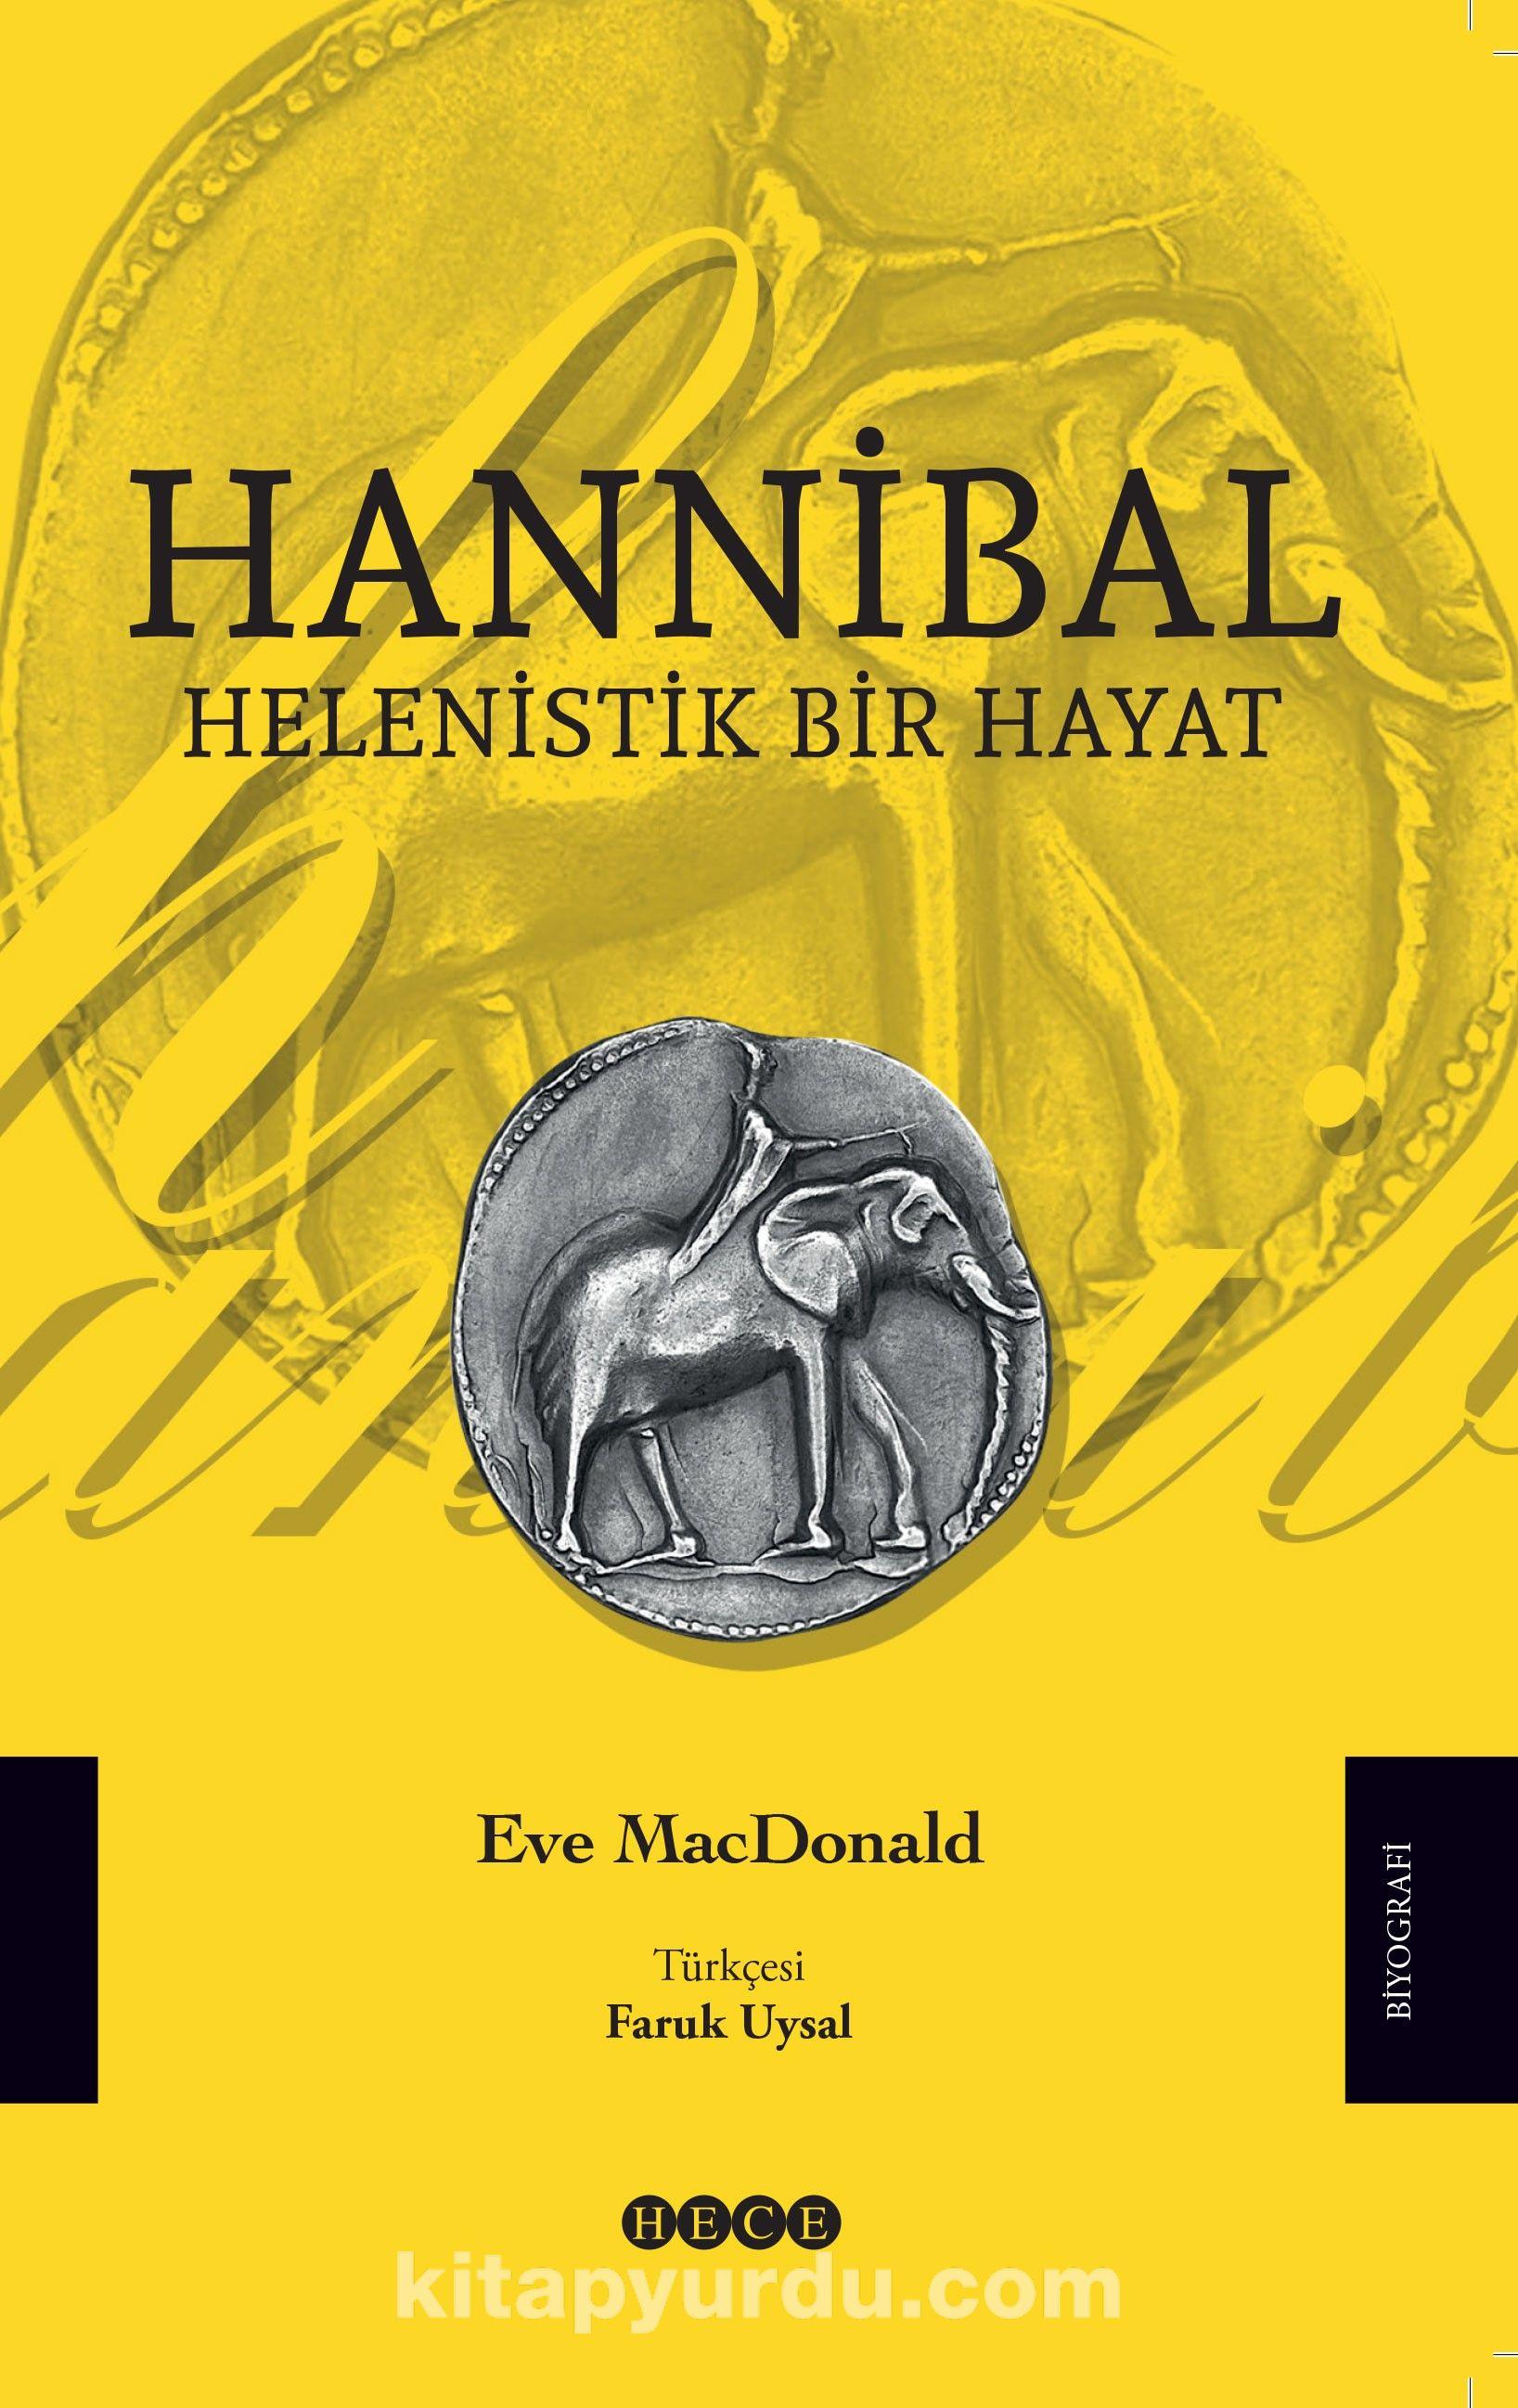 HannibalHelenistik Bir Hayat - Eve MacDonald pdf epub